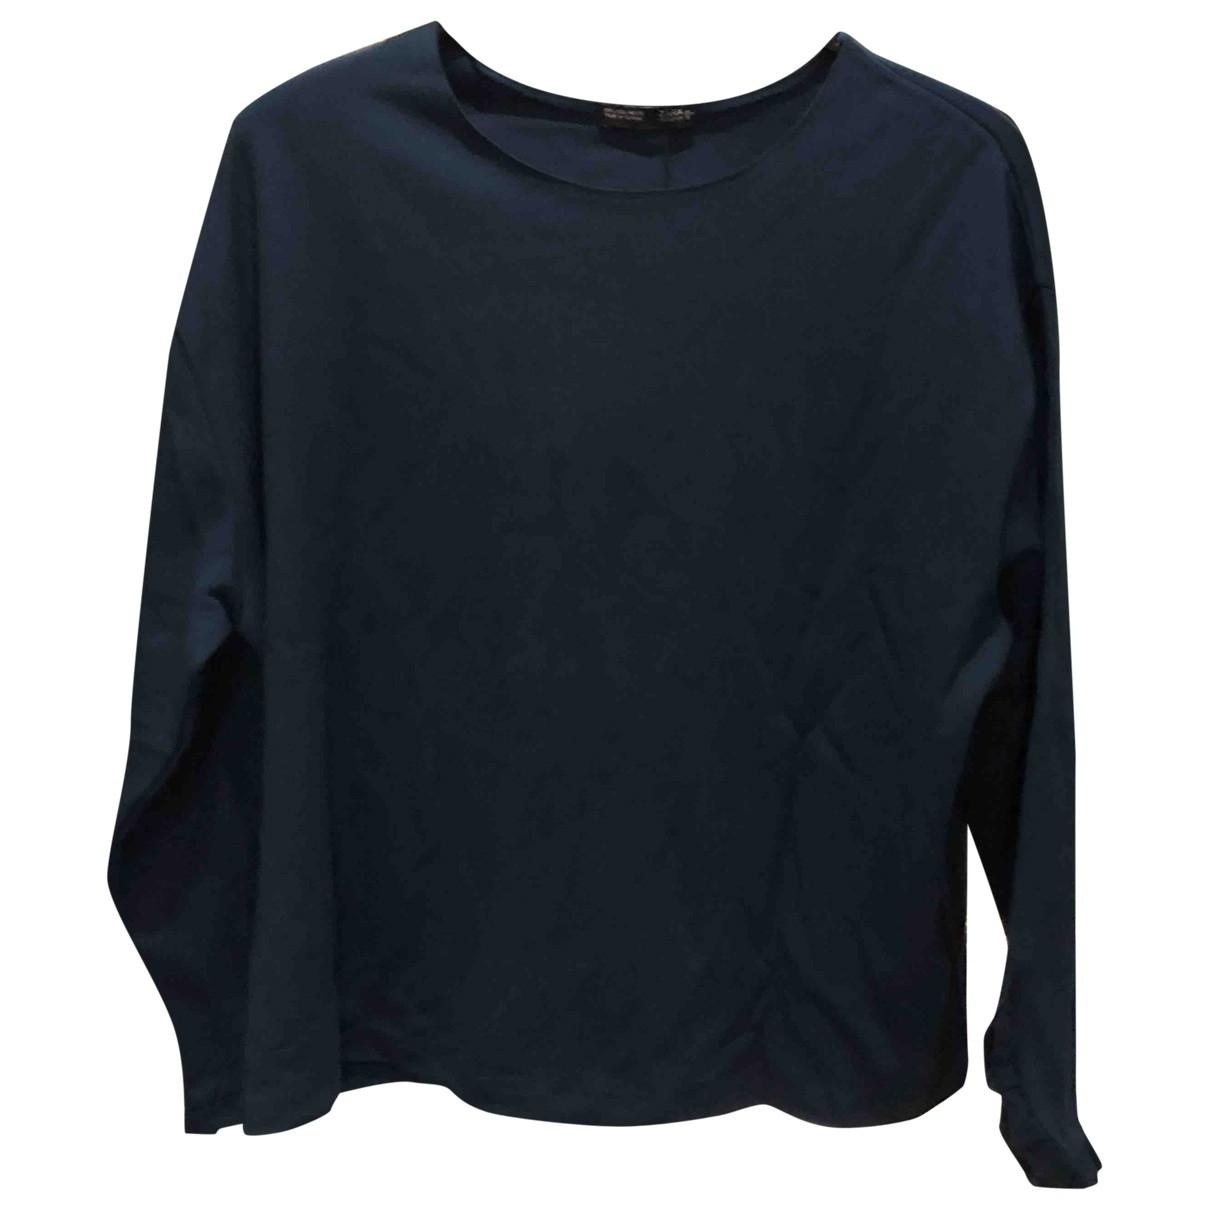 Zara \N Blue Cotton  top for Women L International